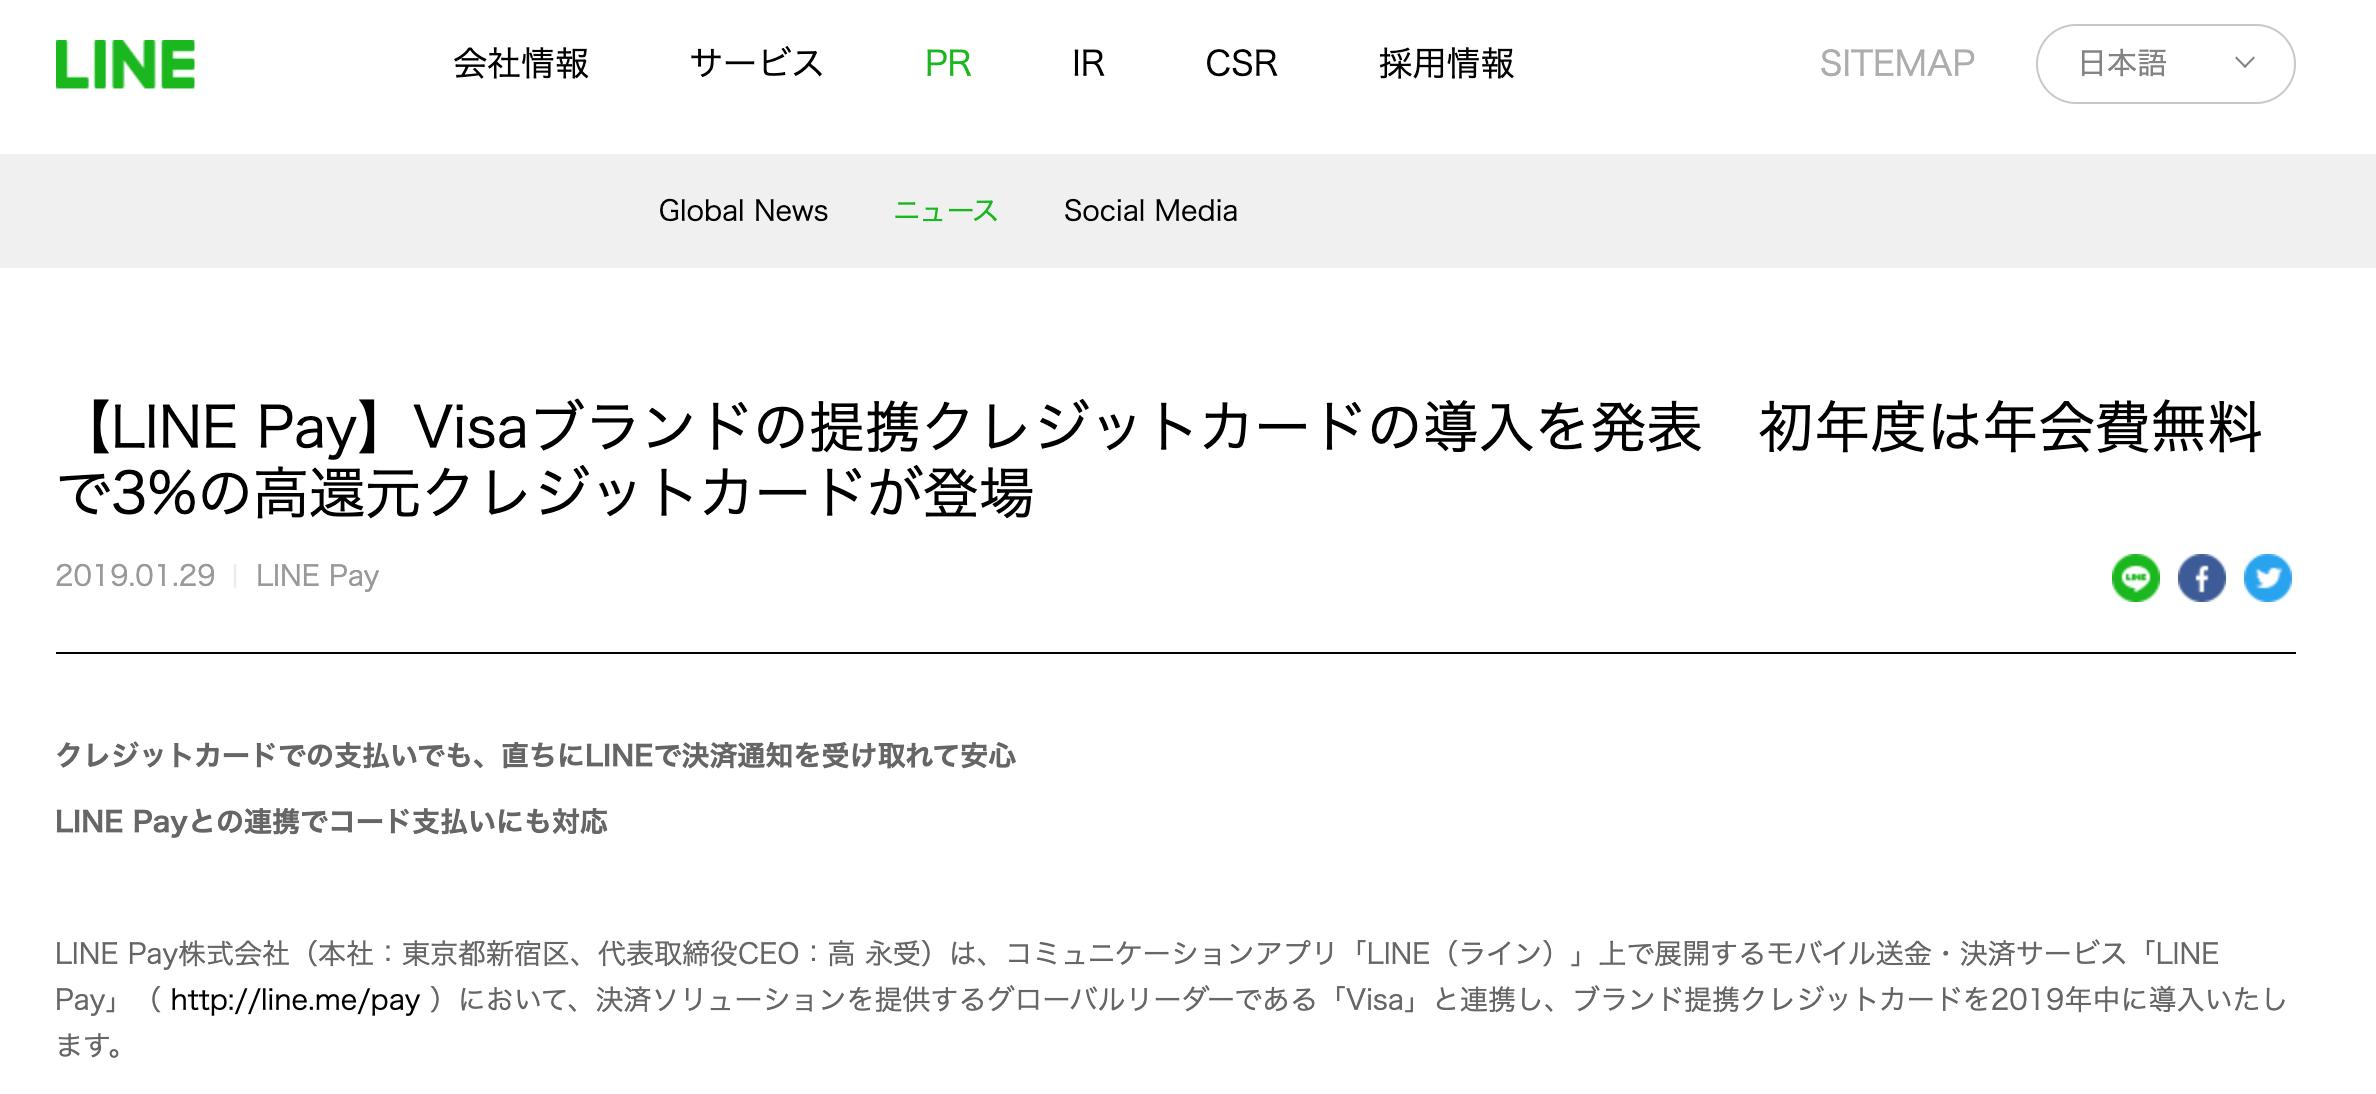 LINE株式会社ニュースリリース